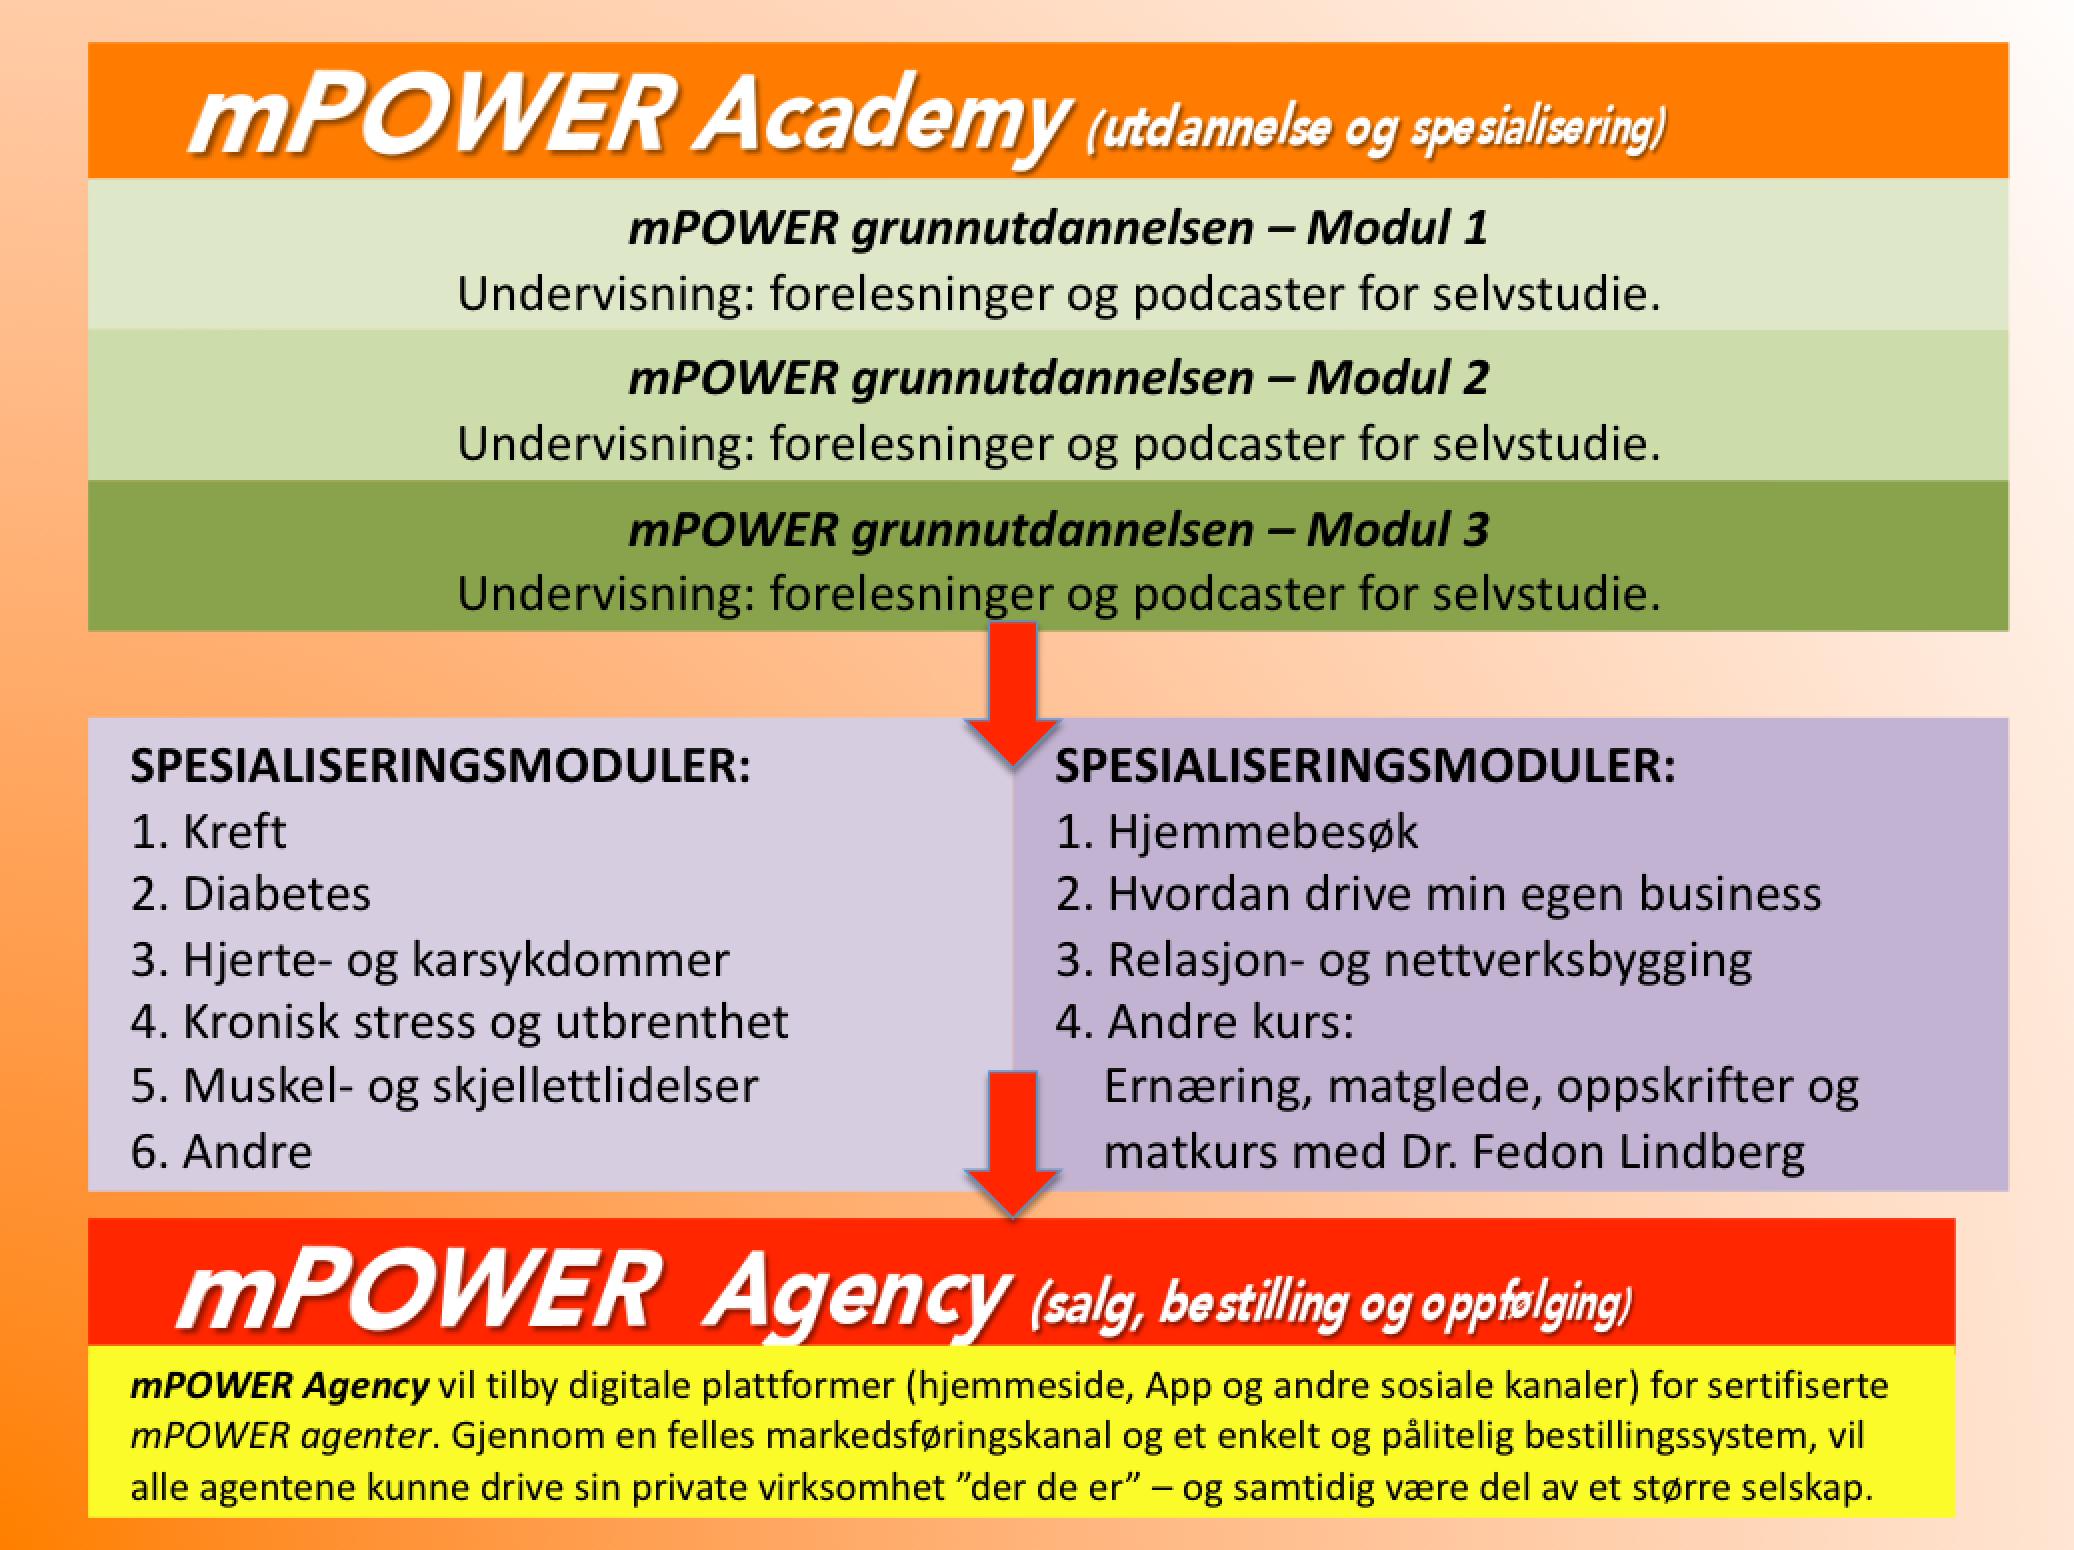 mPOWER utdannelsesmoduler.png